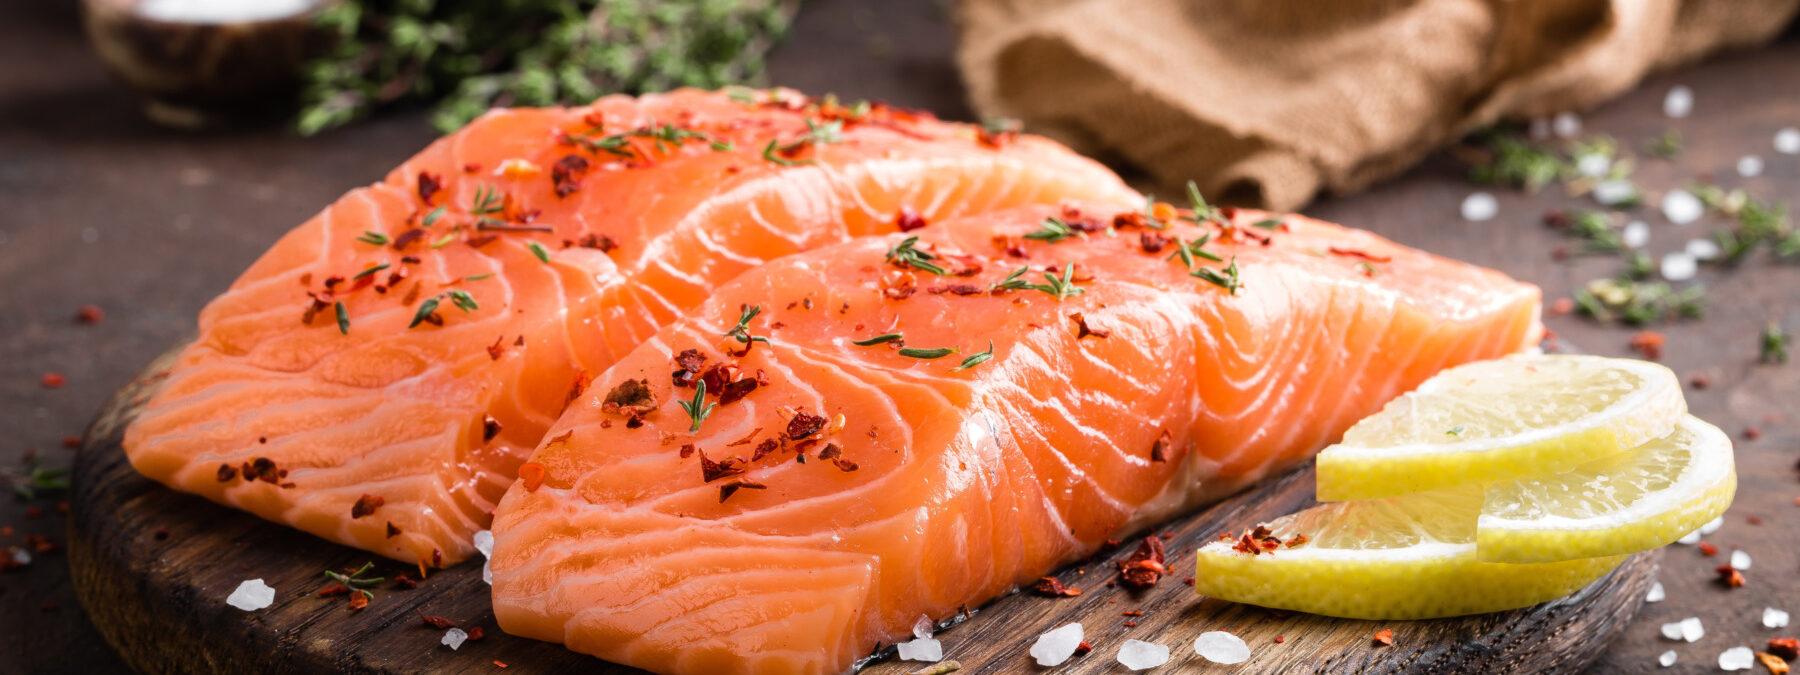 wholesale salmon fillet